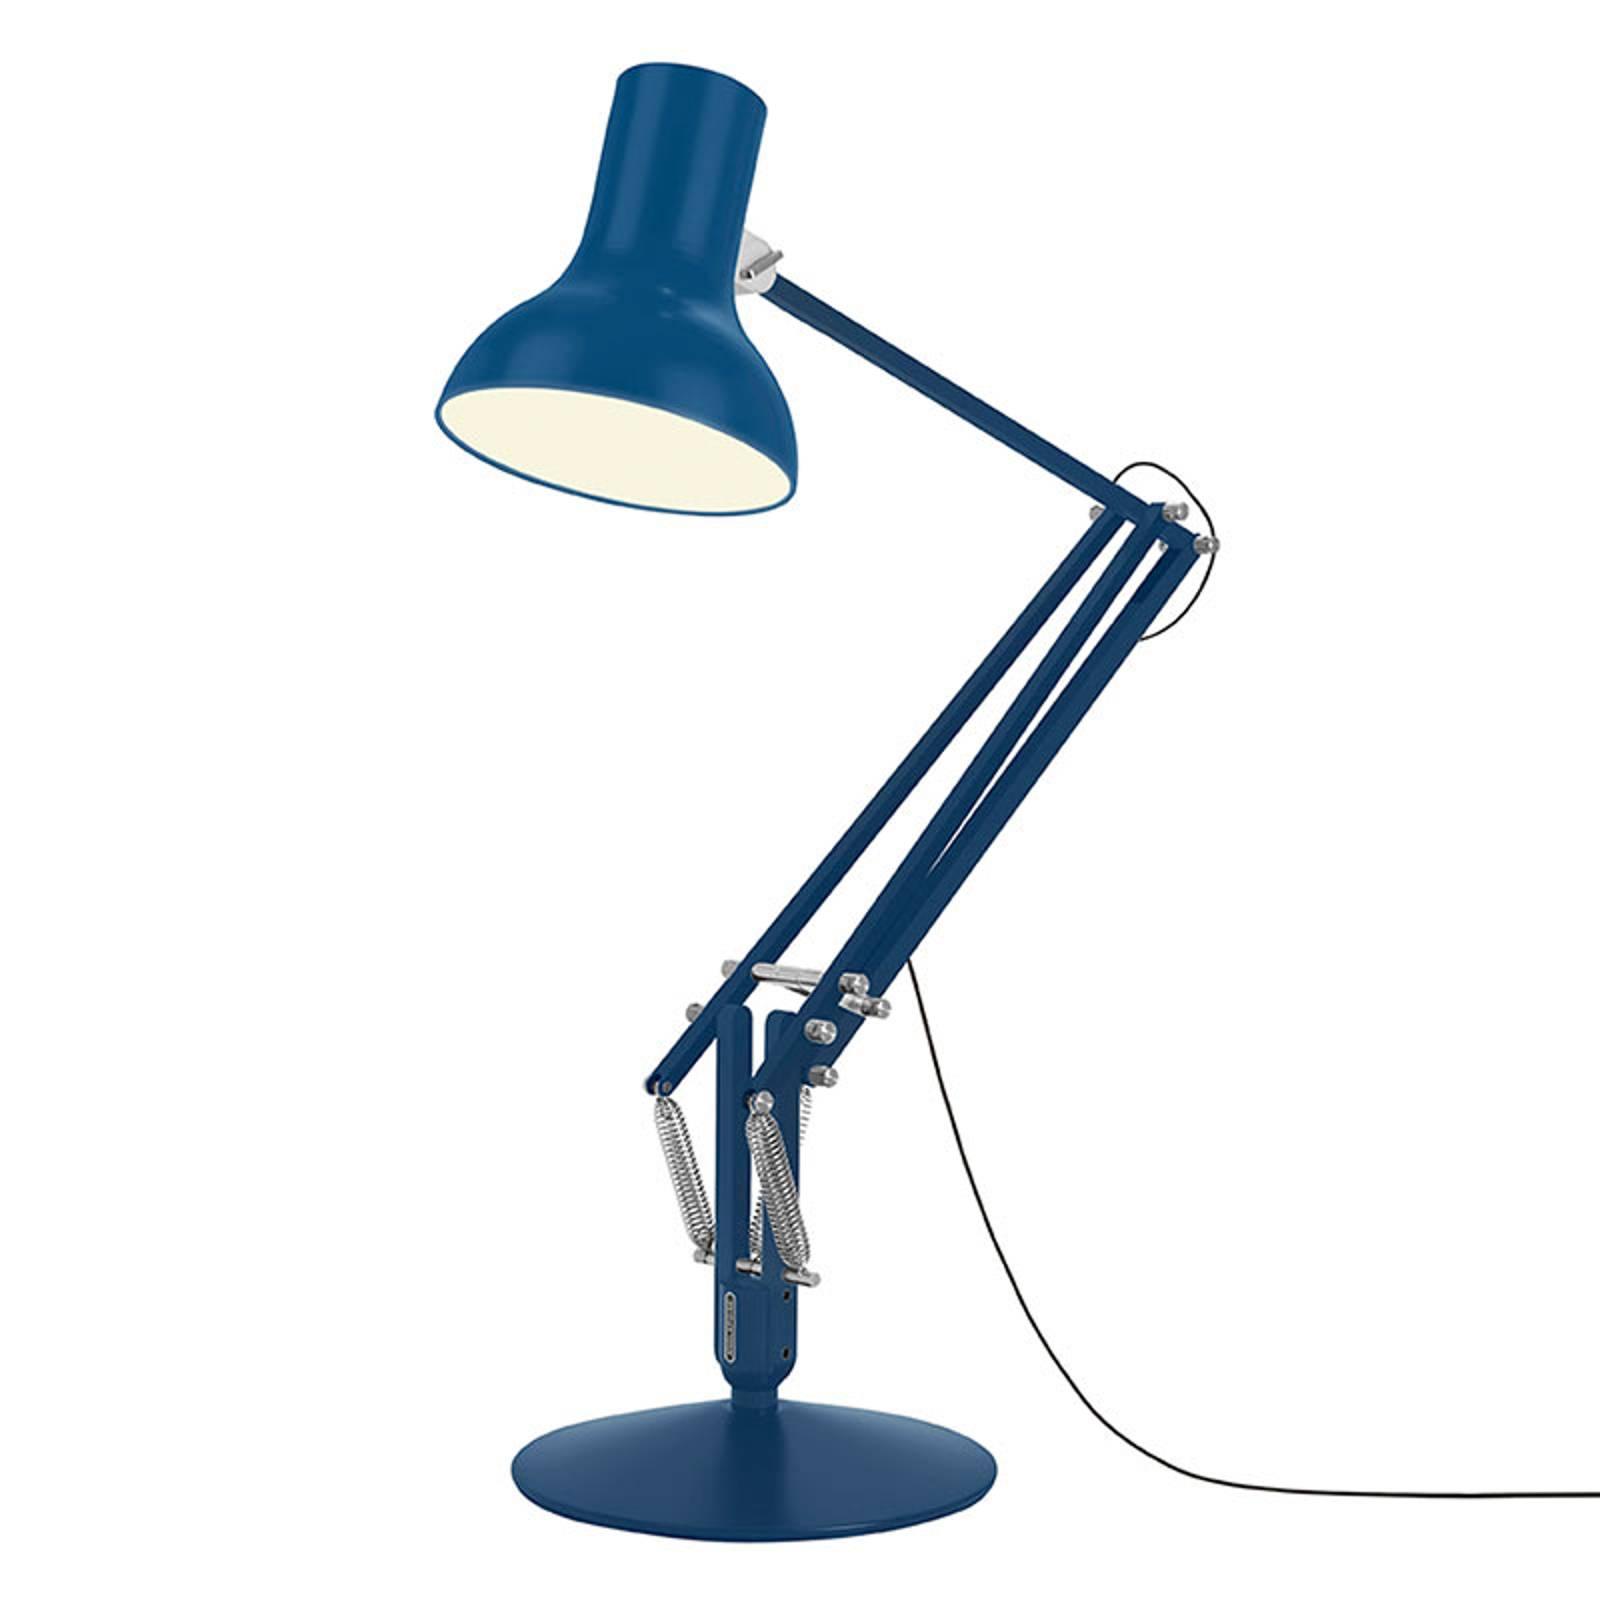 Anglepoise Type 75 Giant lampadaire bleu